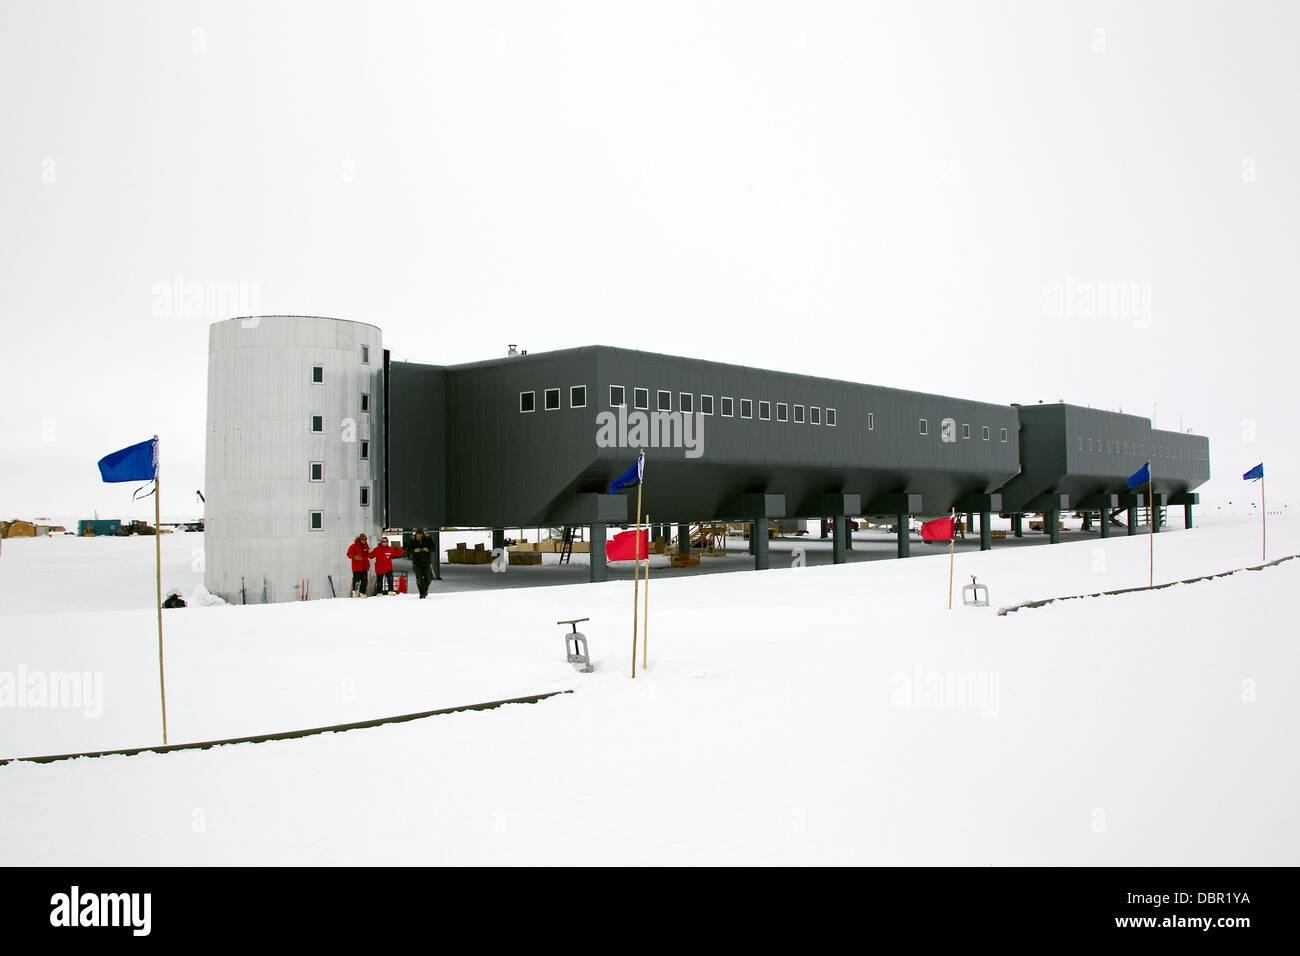 Amundsen-Scott South Pole Station, American scientific research station, South Pole, Antarctica - Stock Image